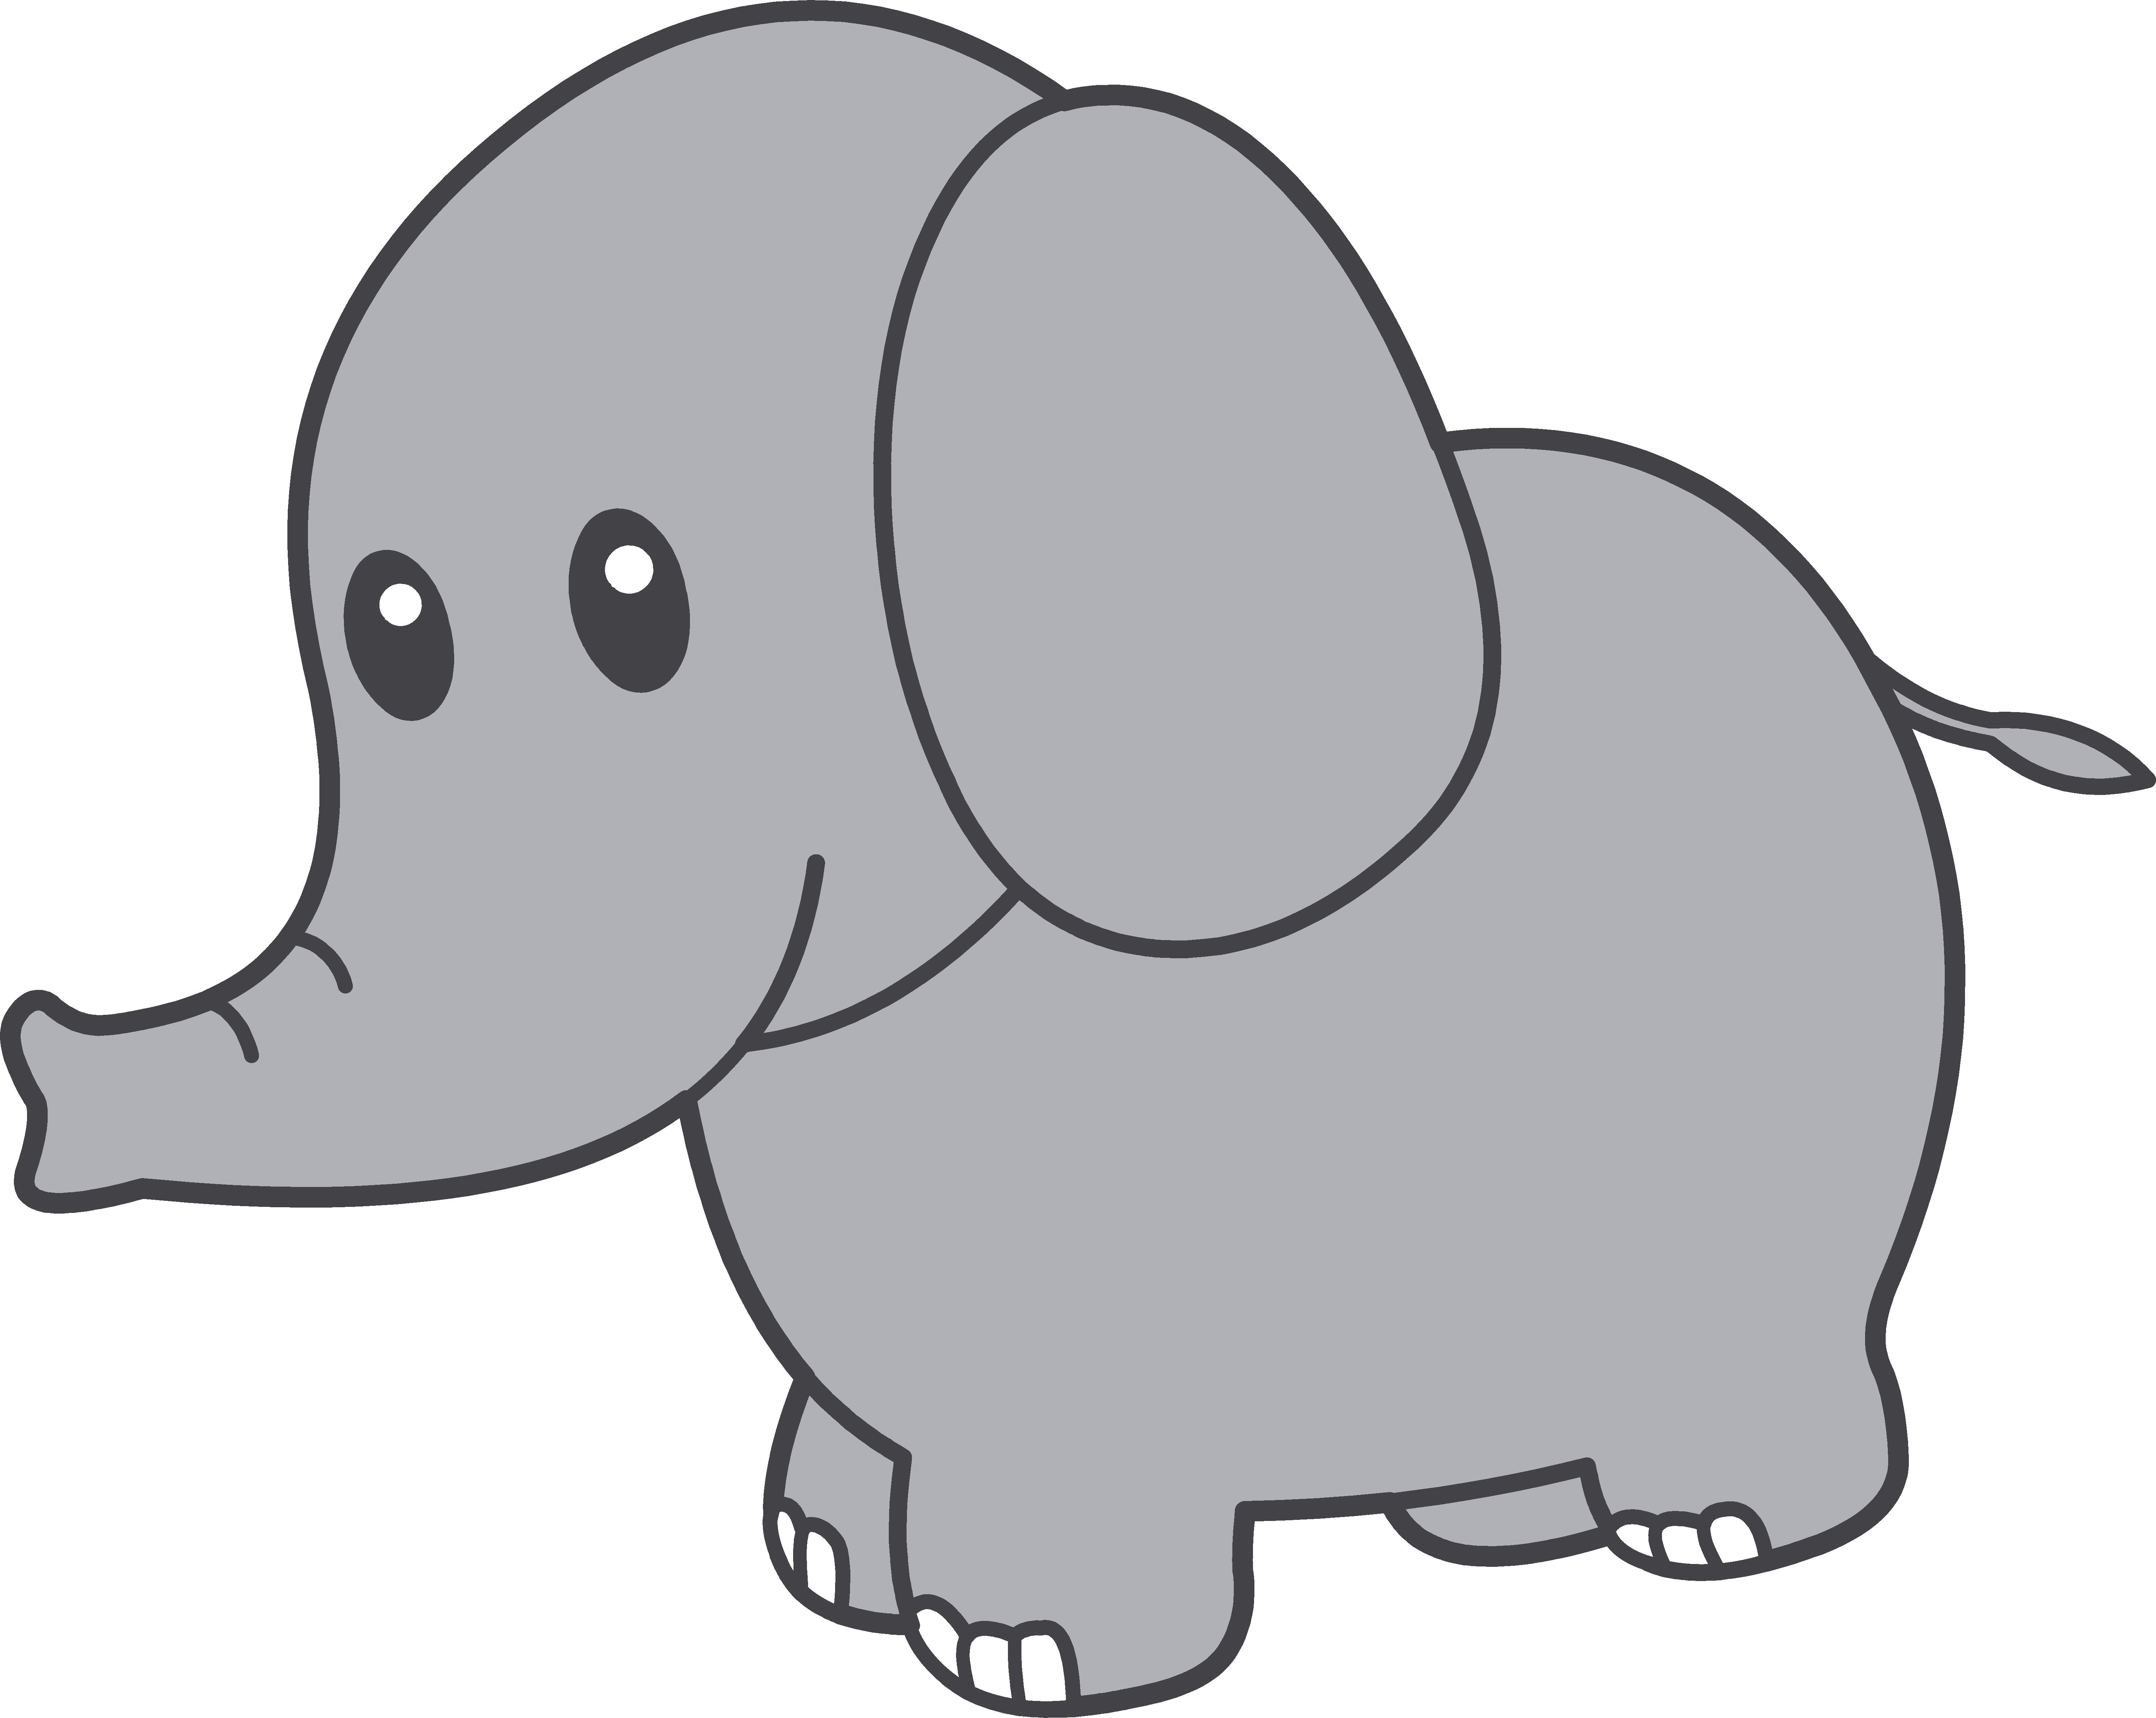 Cute free images my. Graduation clipart elephant